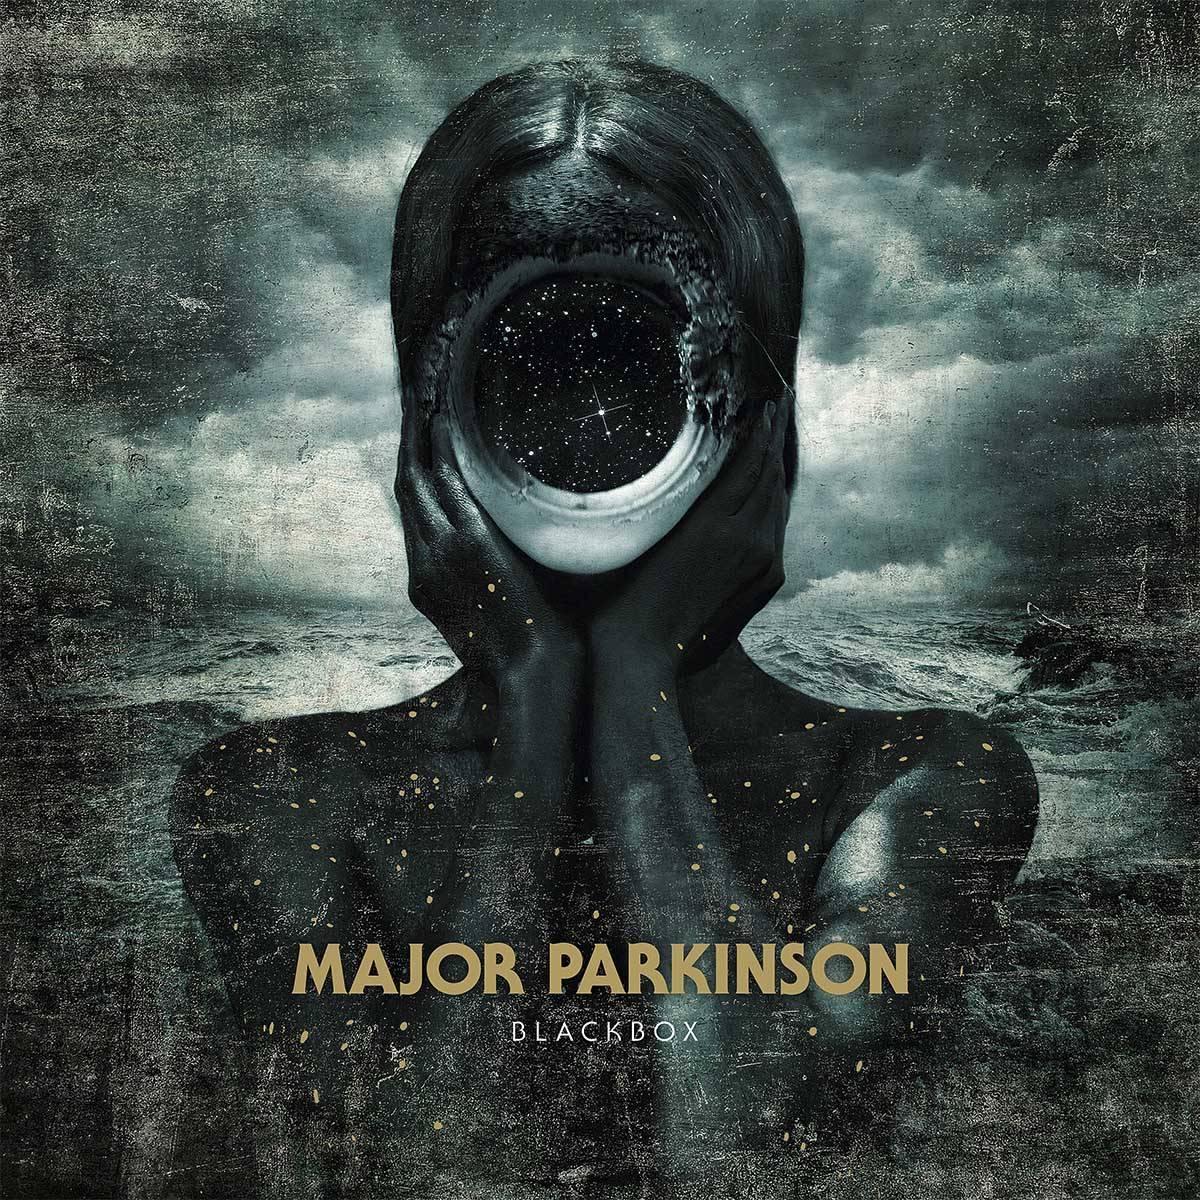 Major Parkinson – Blackbox